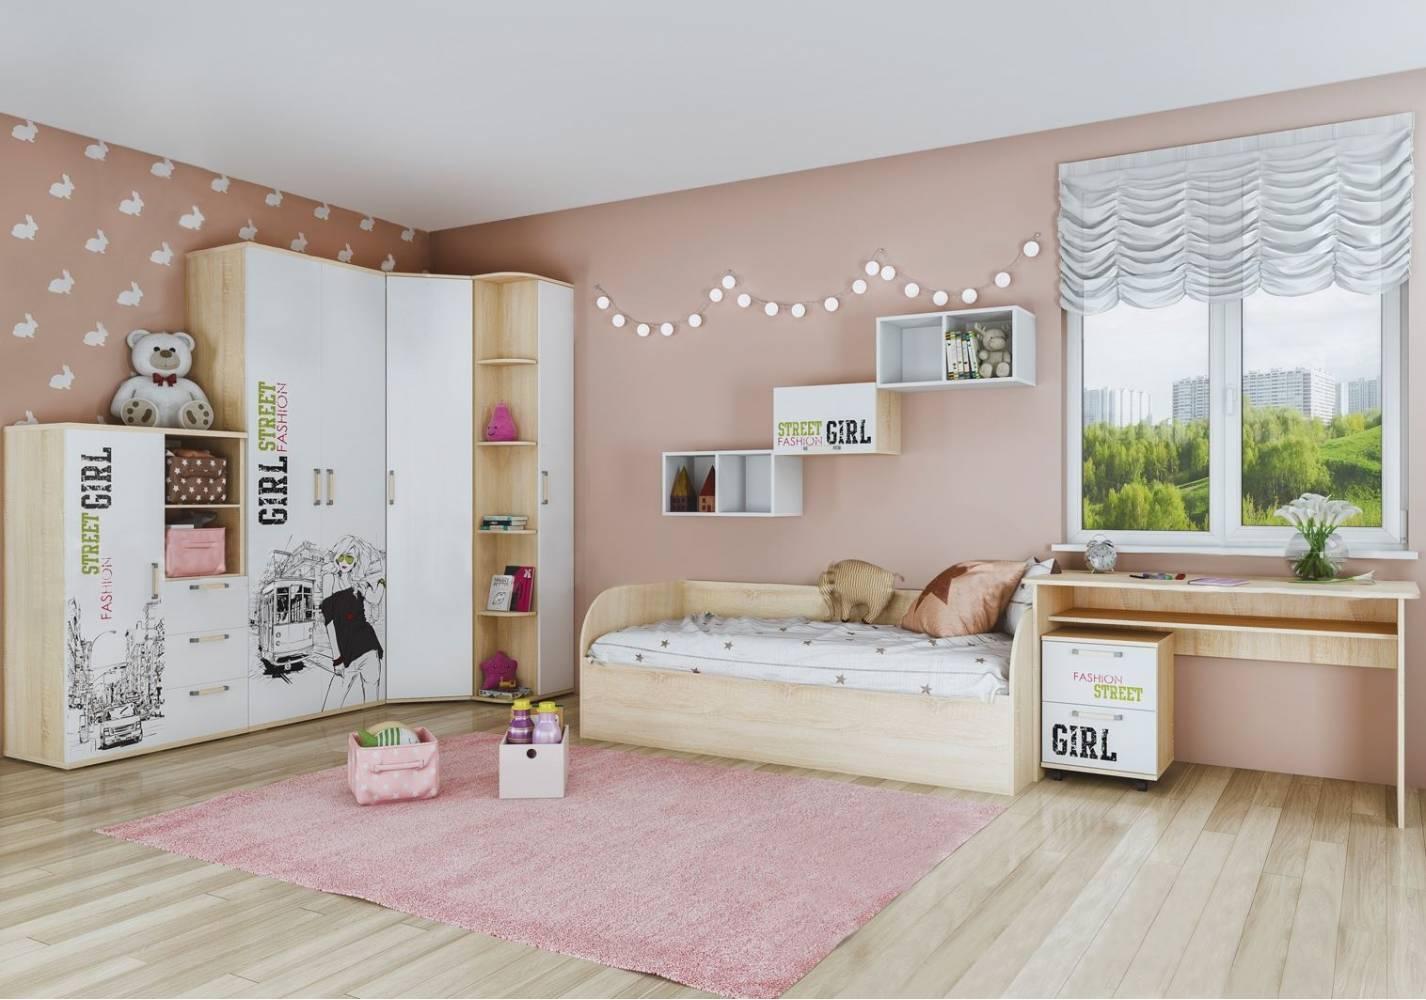 Детская комната Сенди. STREET GIRL